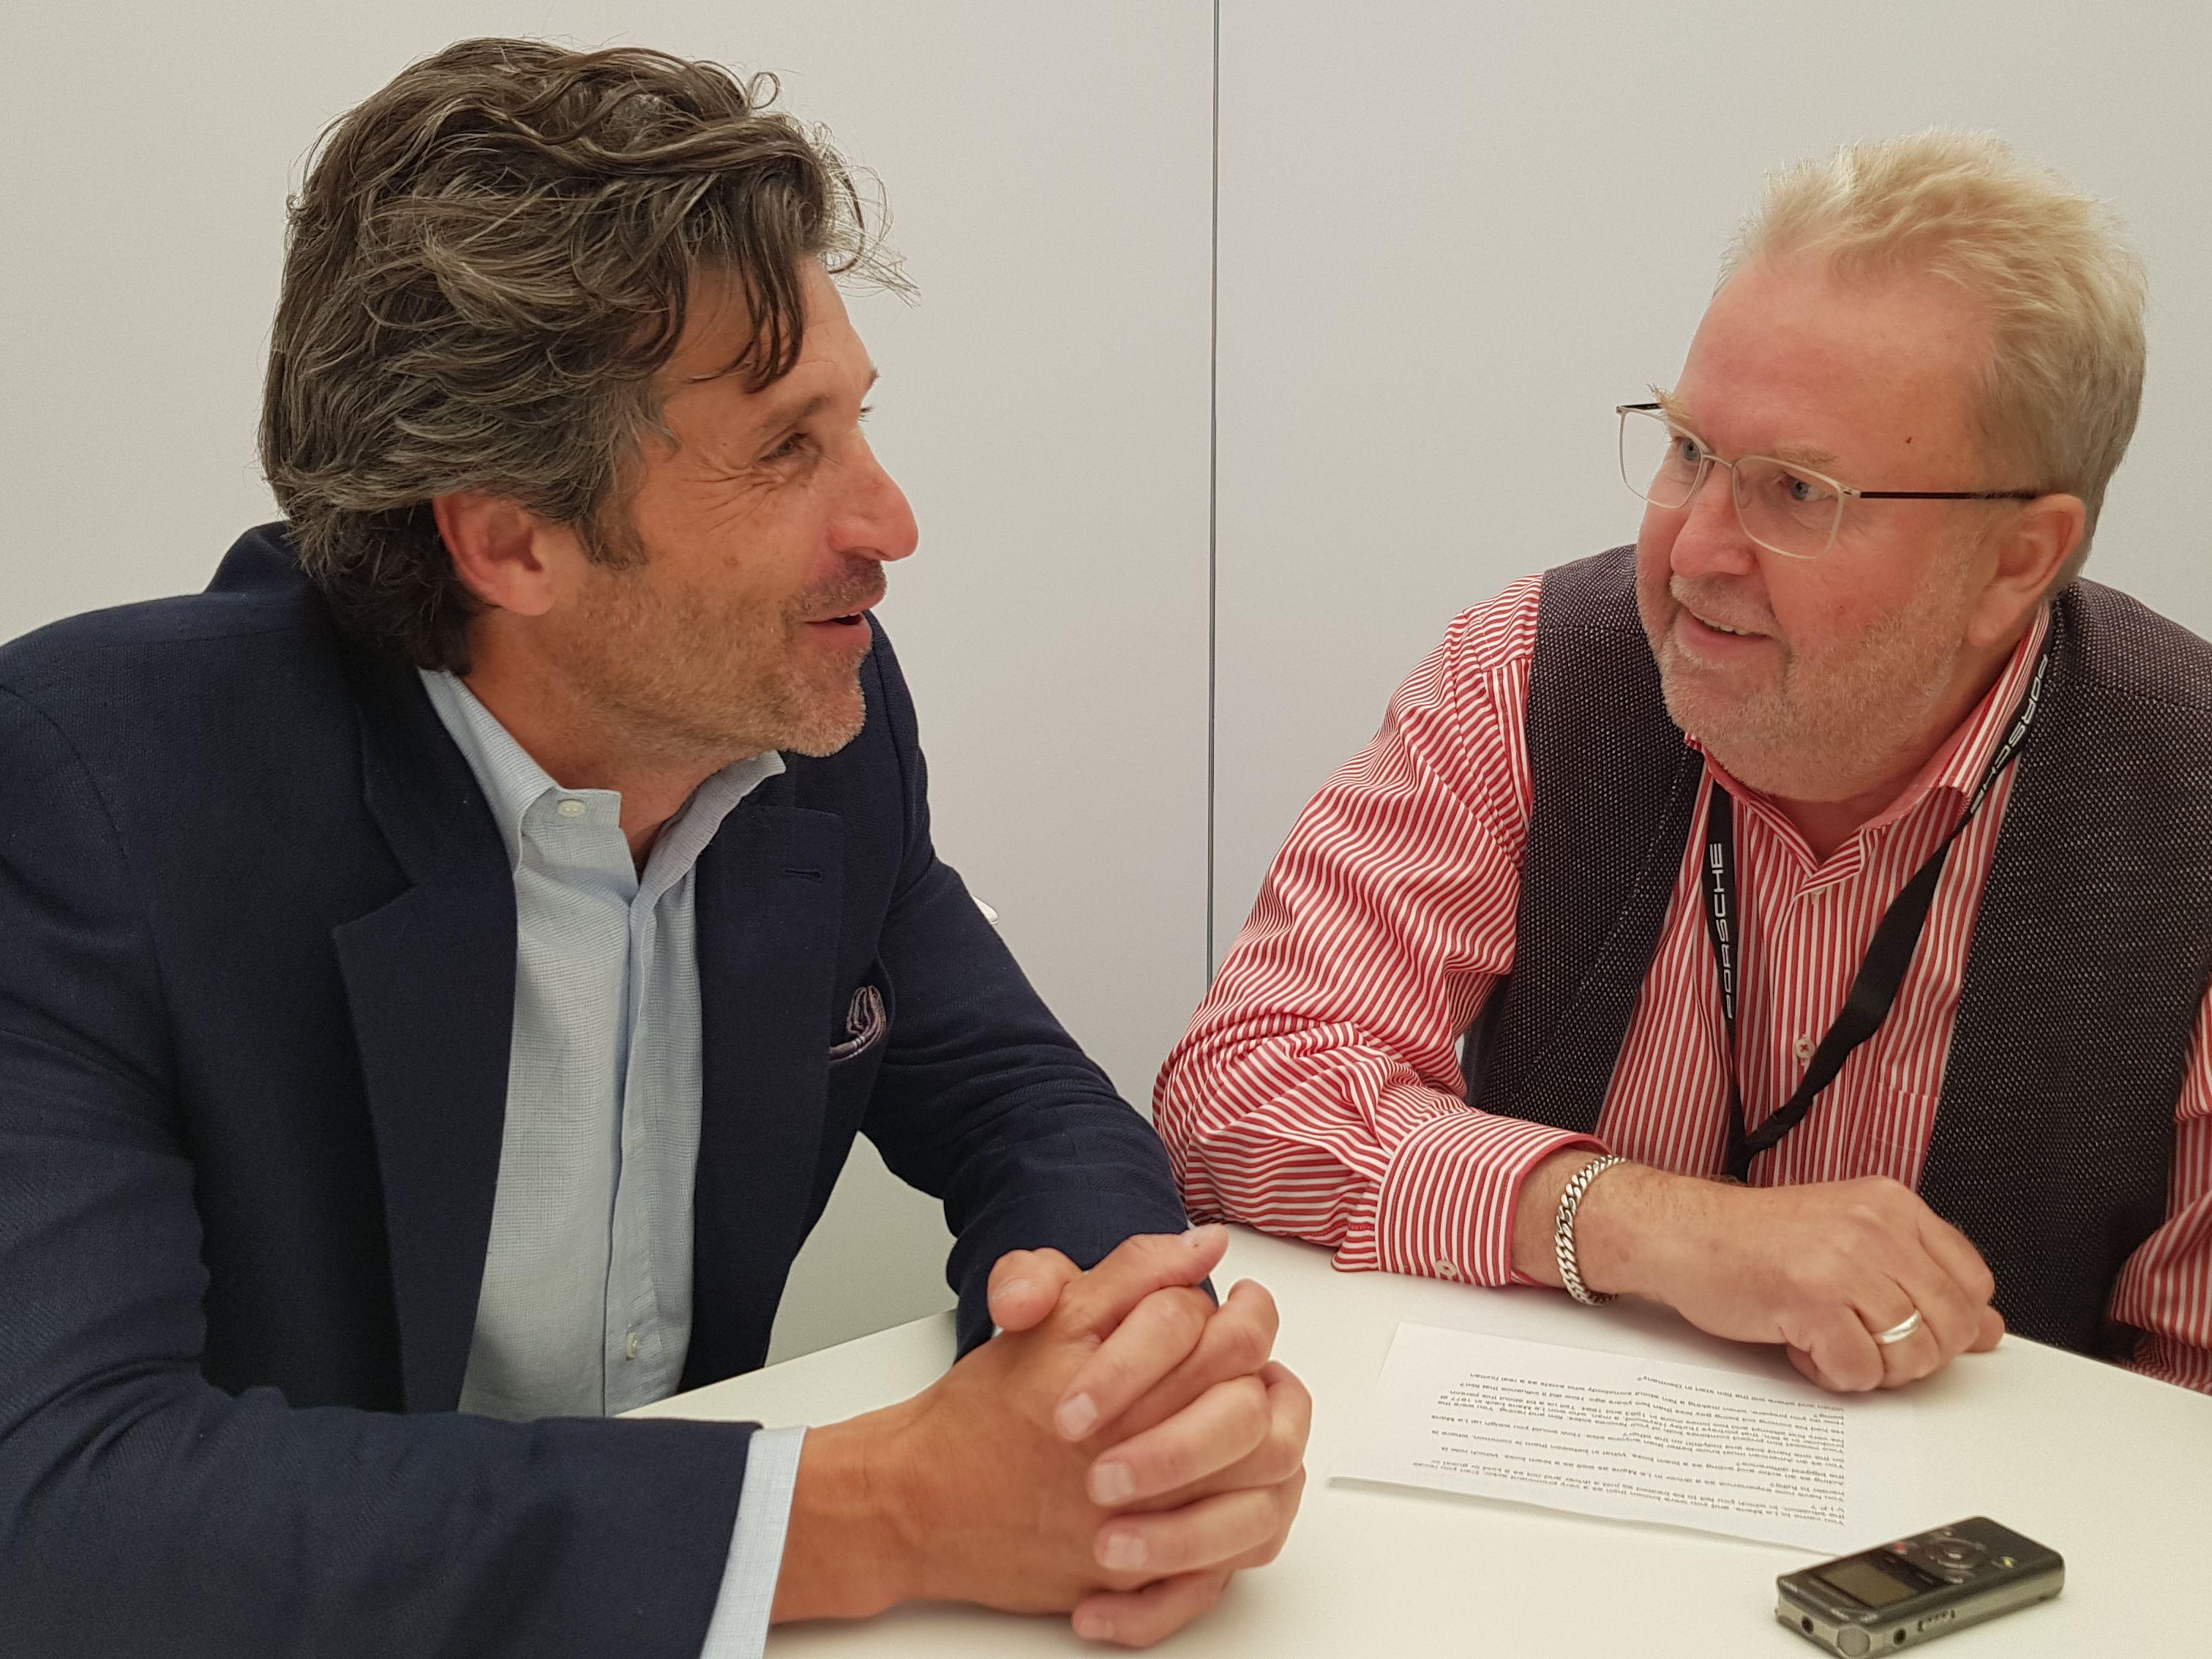 Patrick Dempsey, Stefan Bomhard